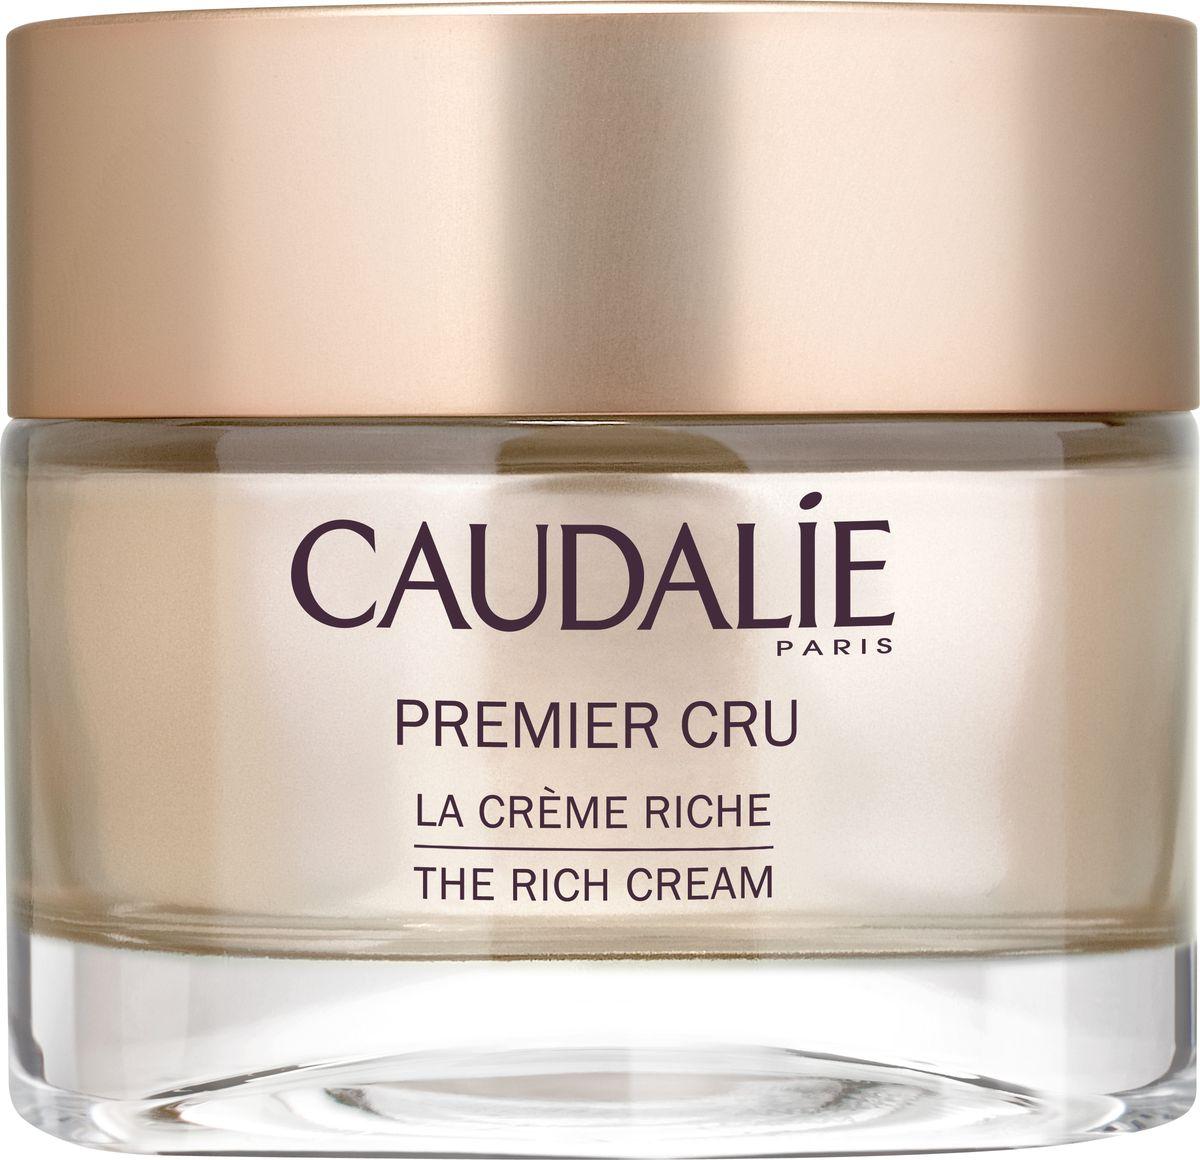 Caudalie Омолаживающий крем для сухой кожи Premier Cru, 50 мл caudalie омолаживающий крем для глаз premier cru 15 мл